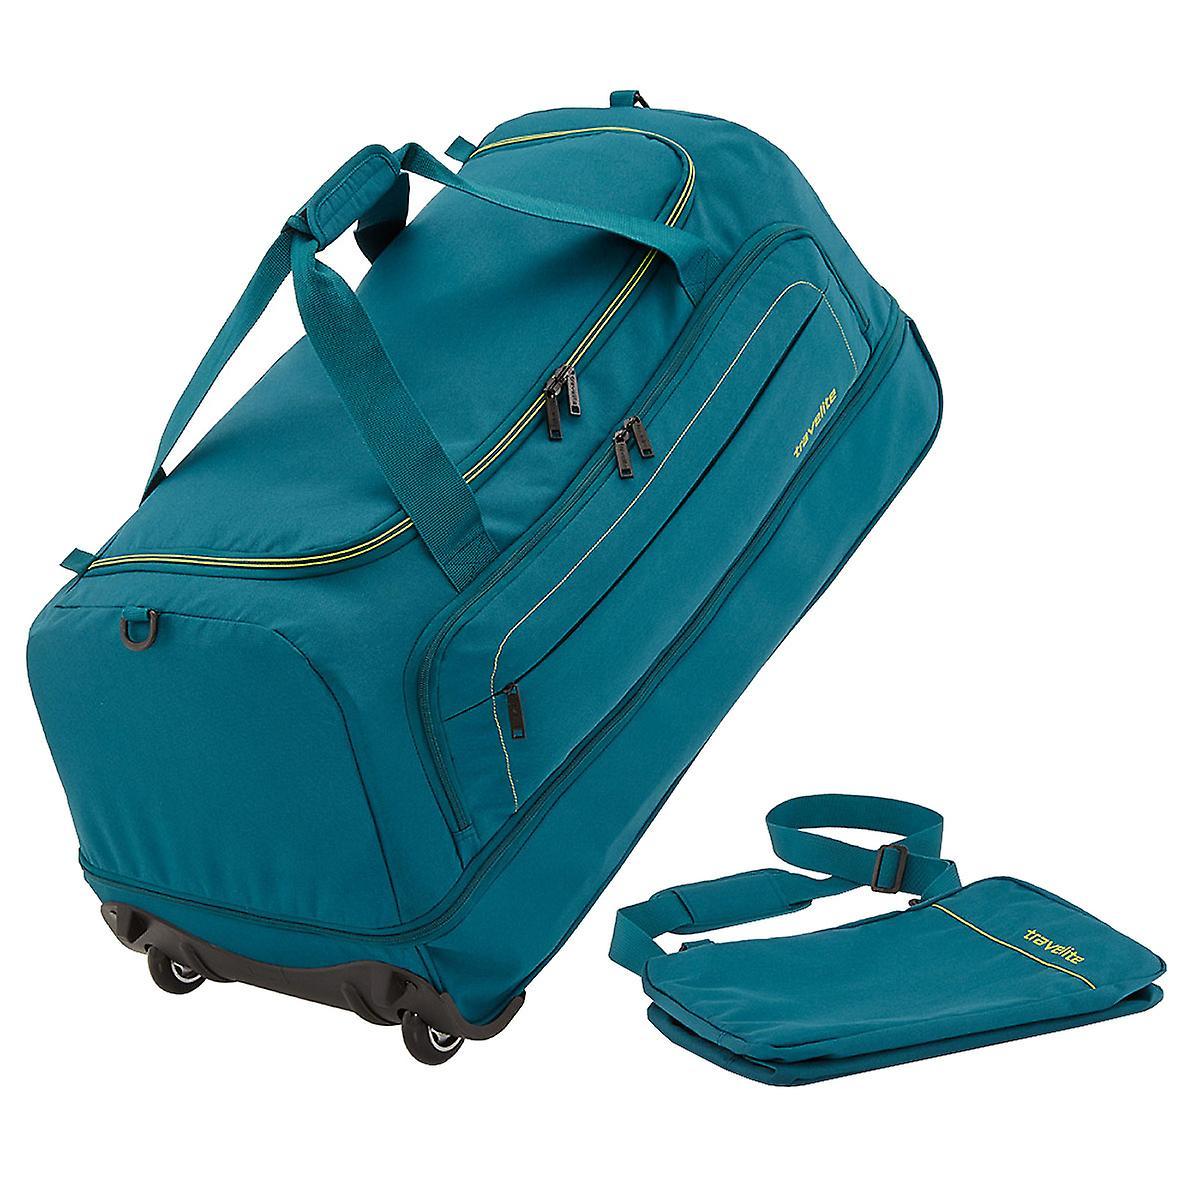 9165eabe6e Travelite basics folding rolling travel bag foldable bag Duffel trolley